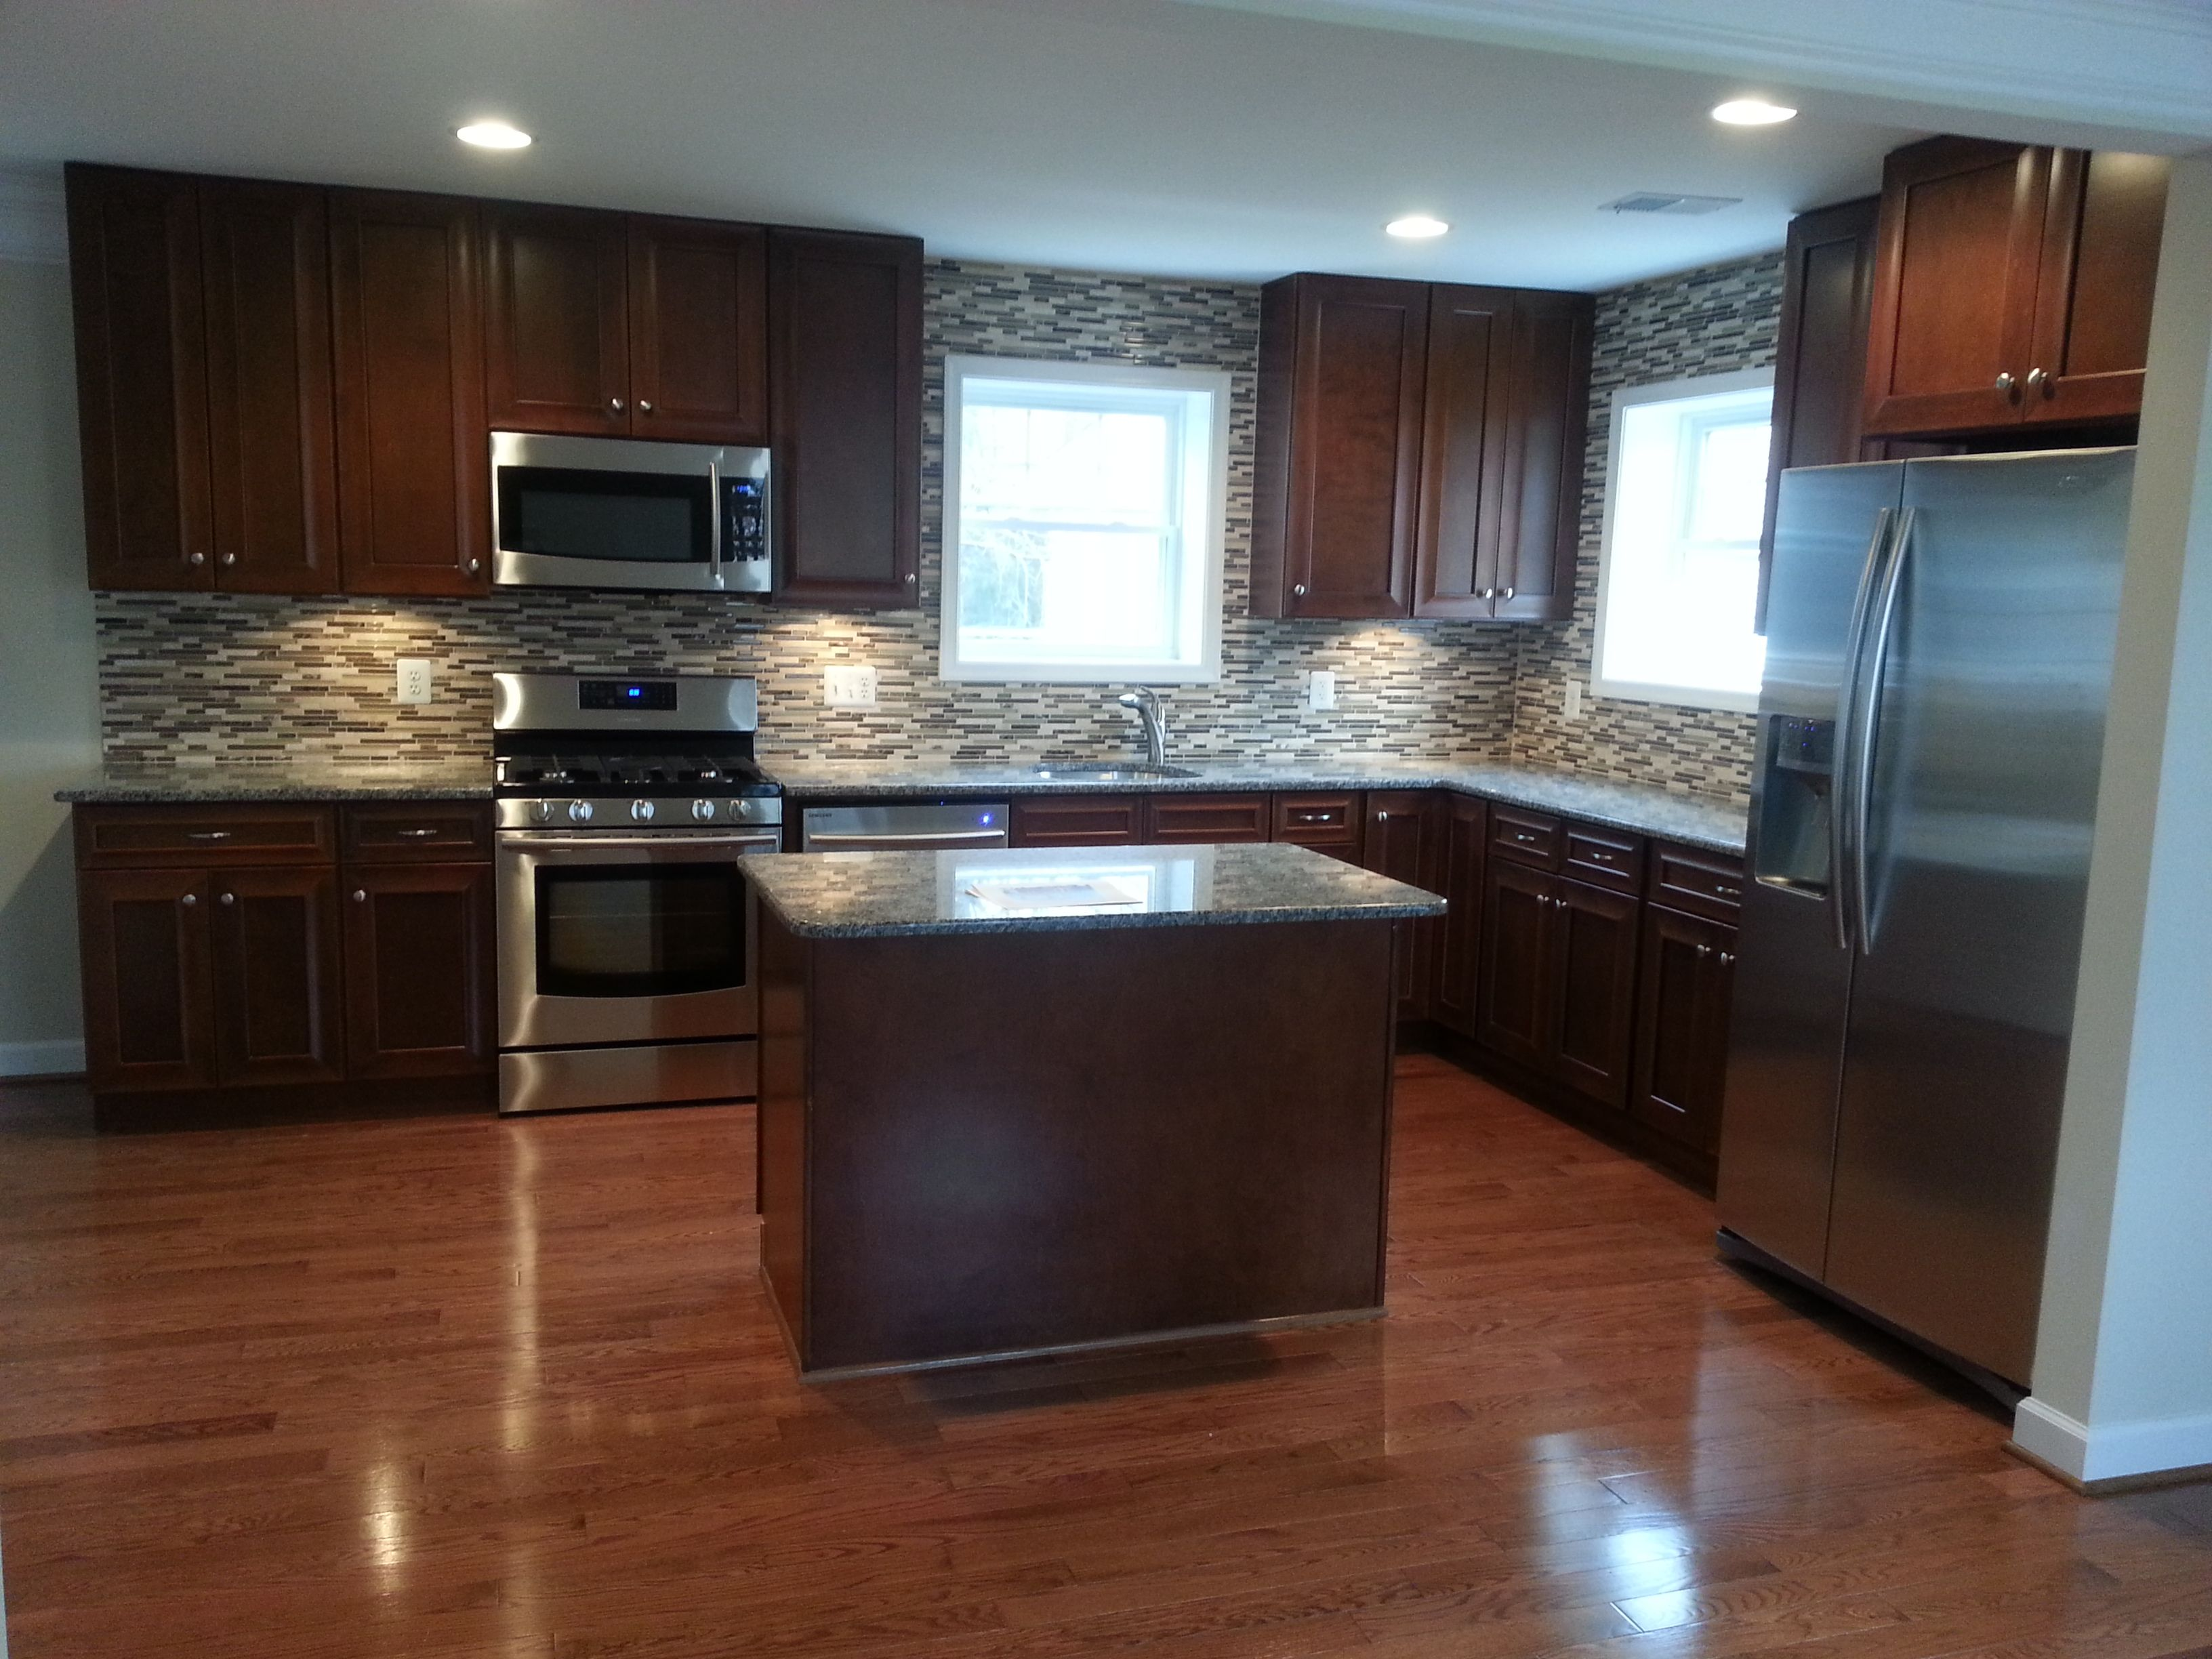 Kitchen with oak hardwood floors, maple granite